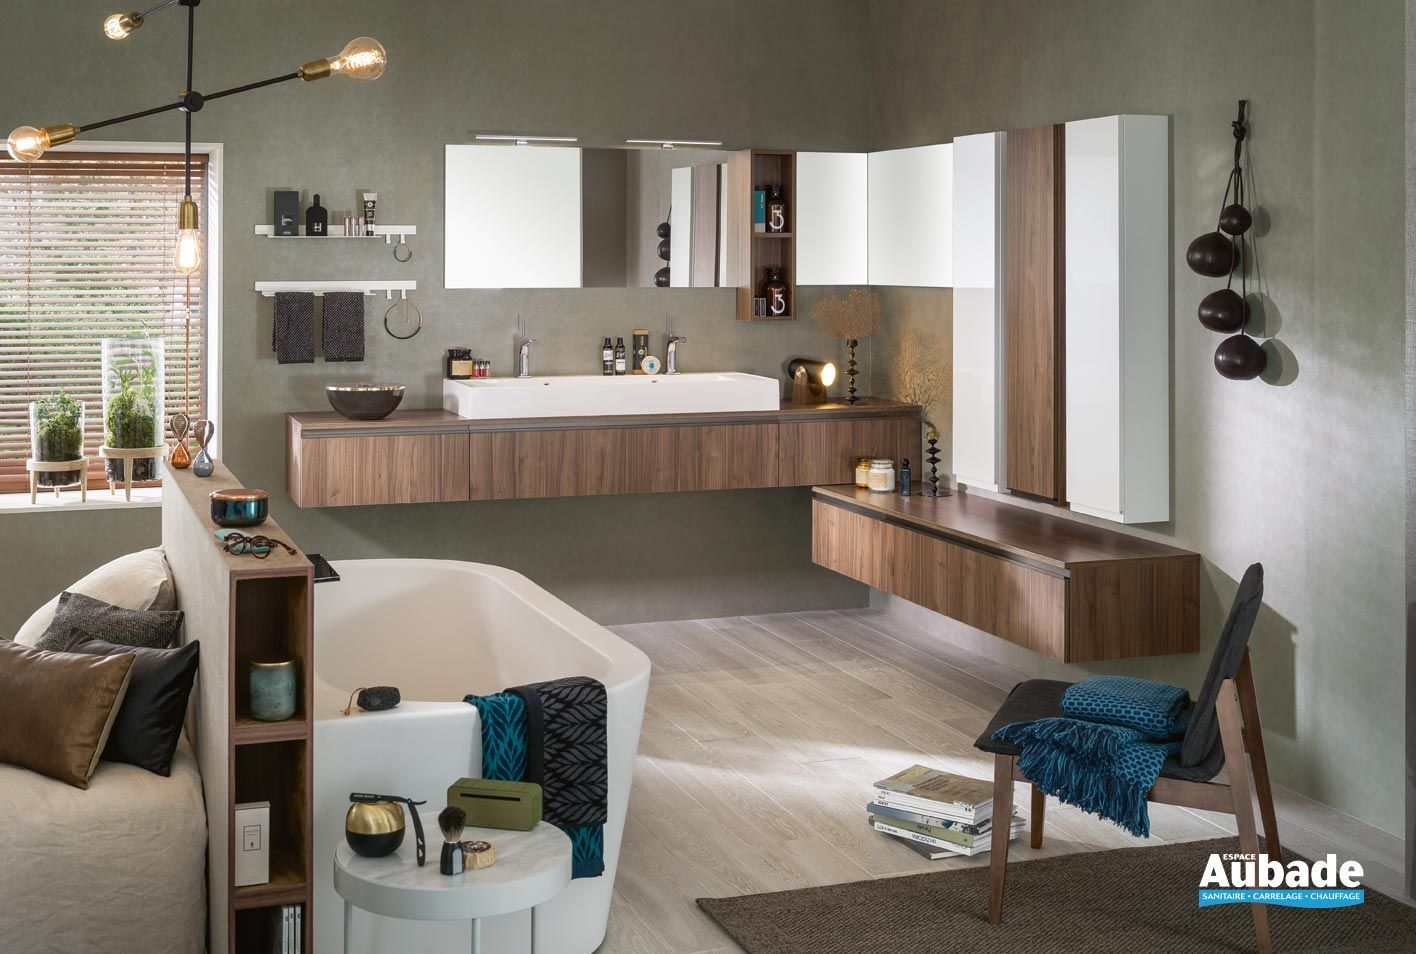 Meubles salle de bains Unique Origine 17 Delpha  Espace Aubade